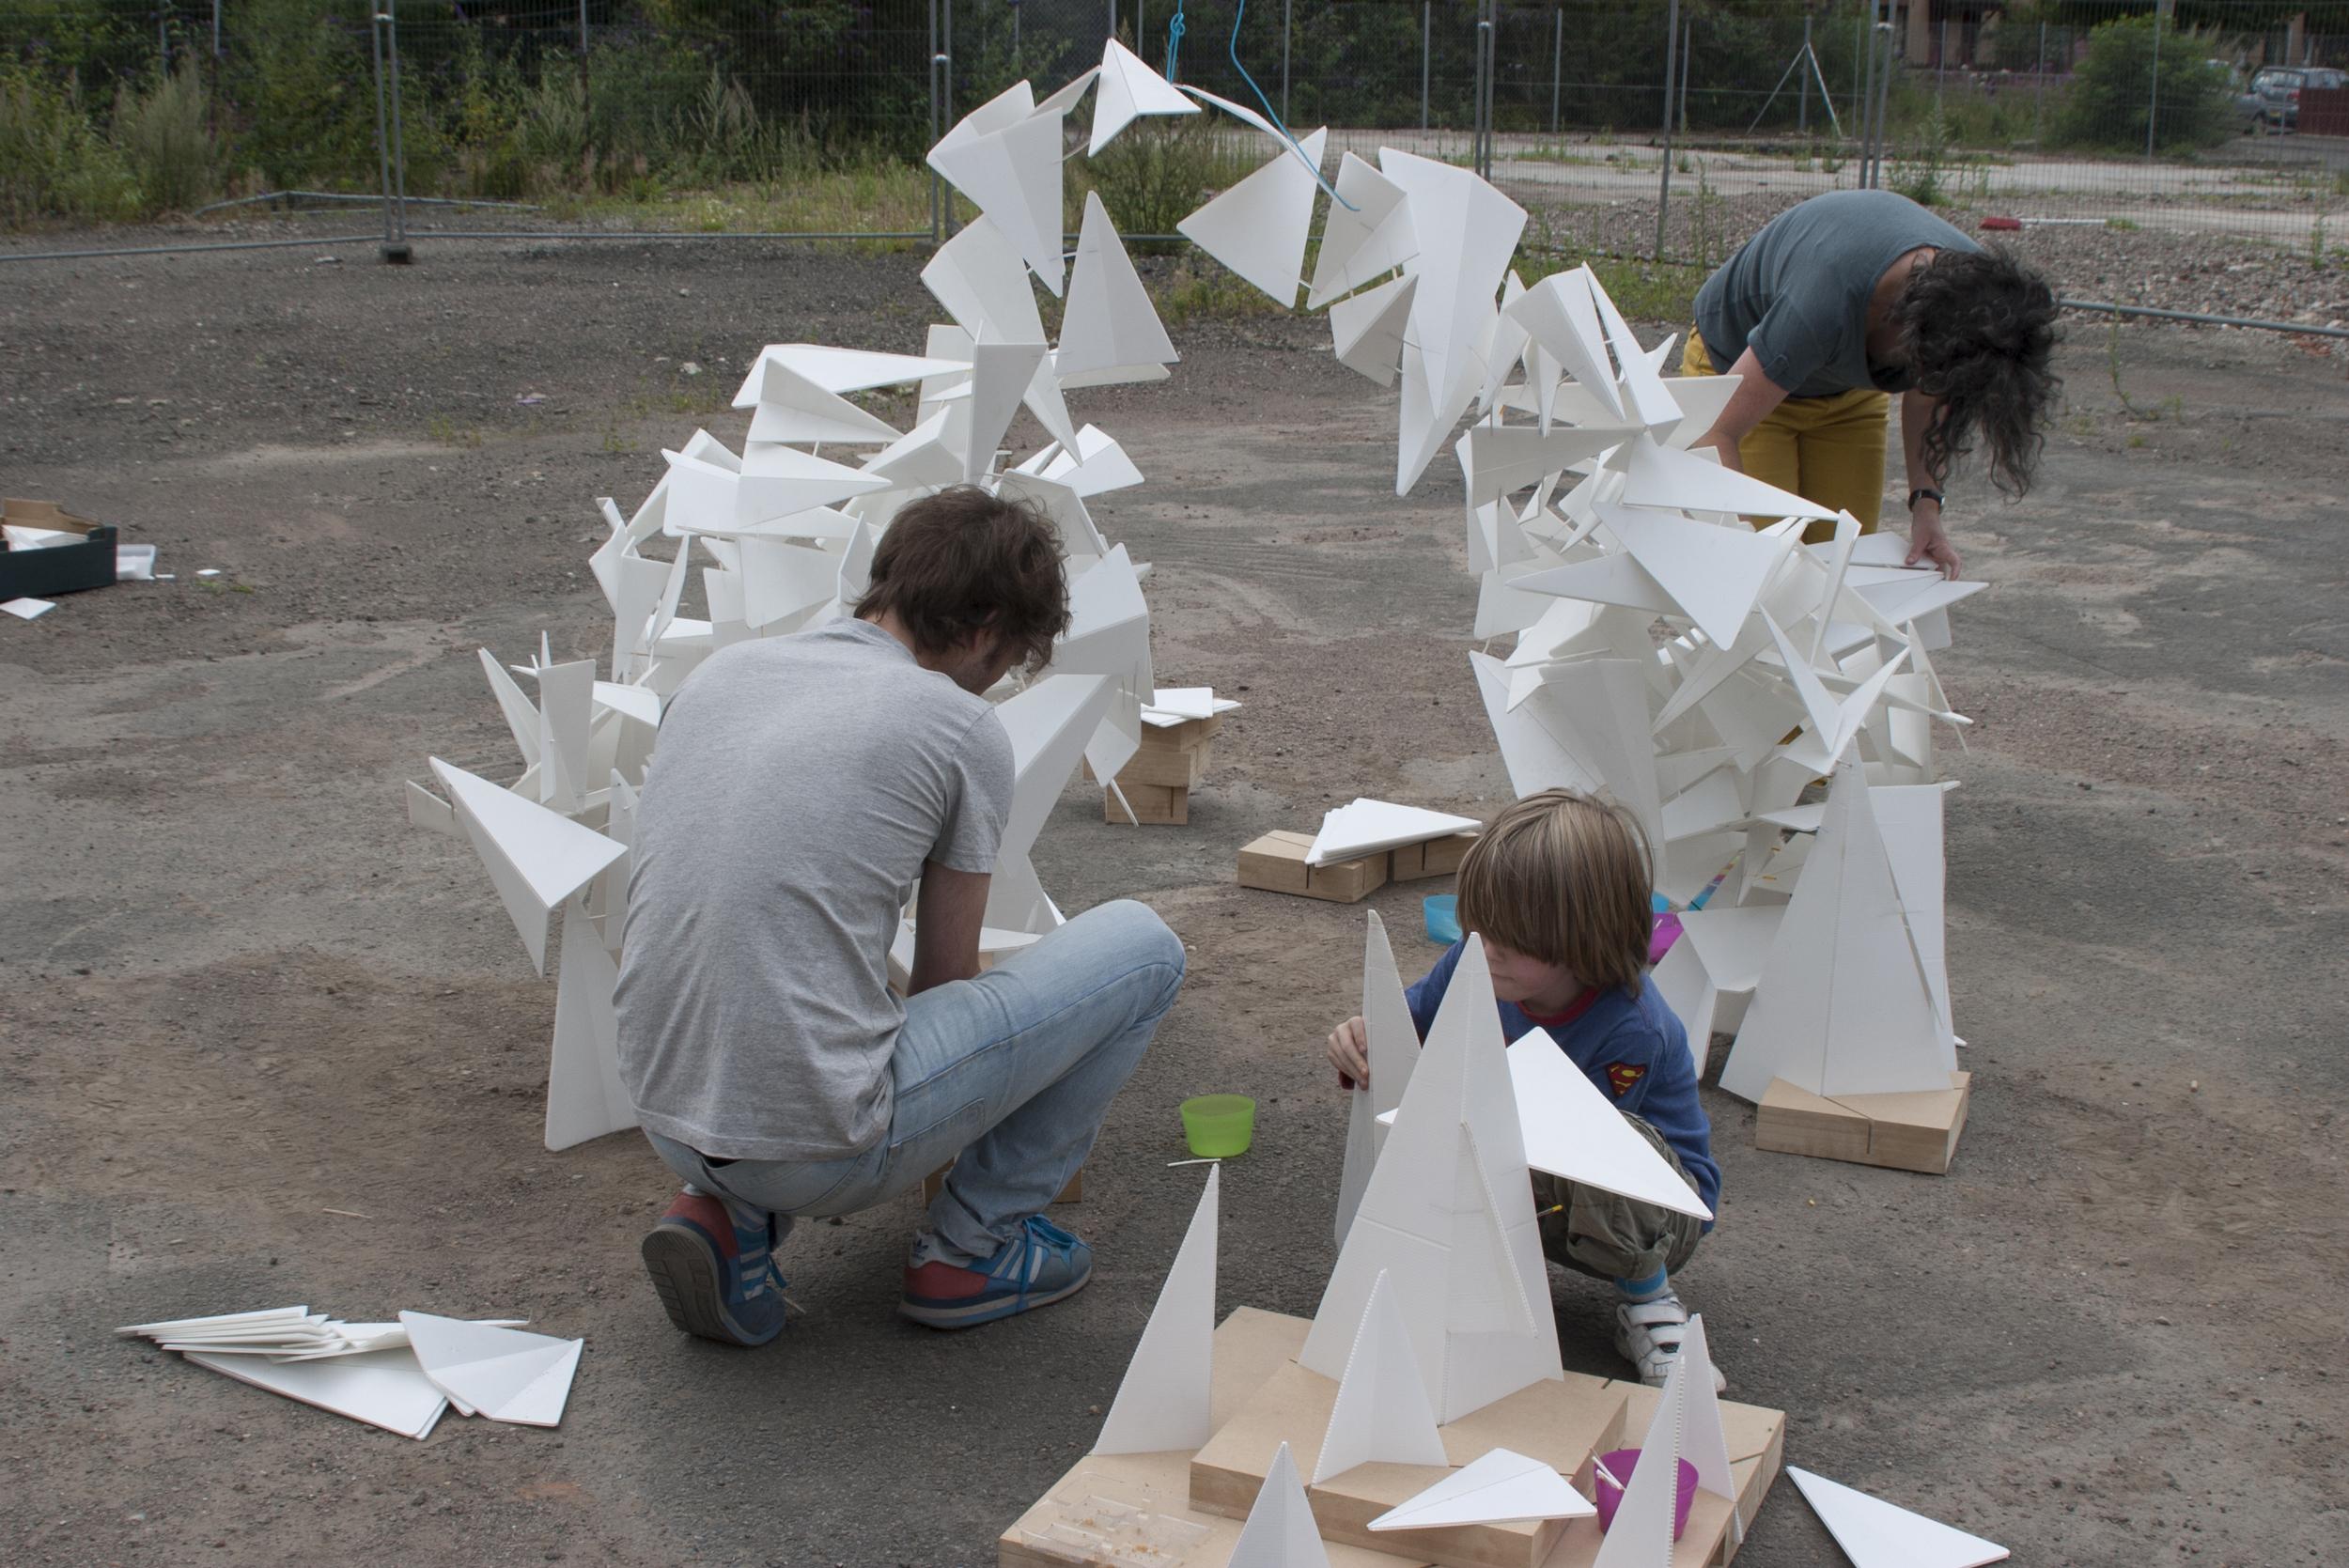 triangle_pavilion_9.jpg